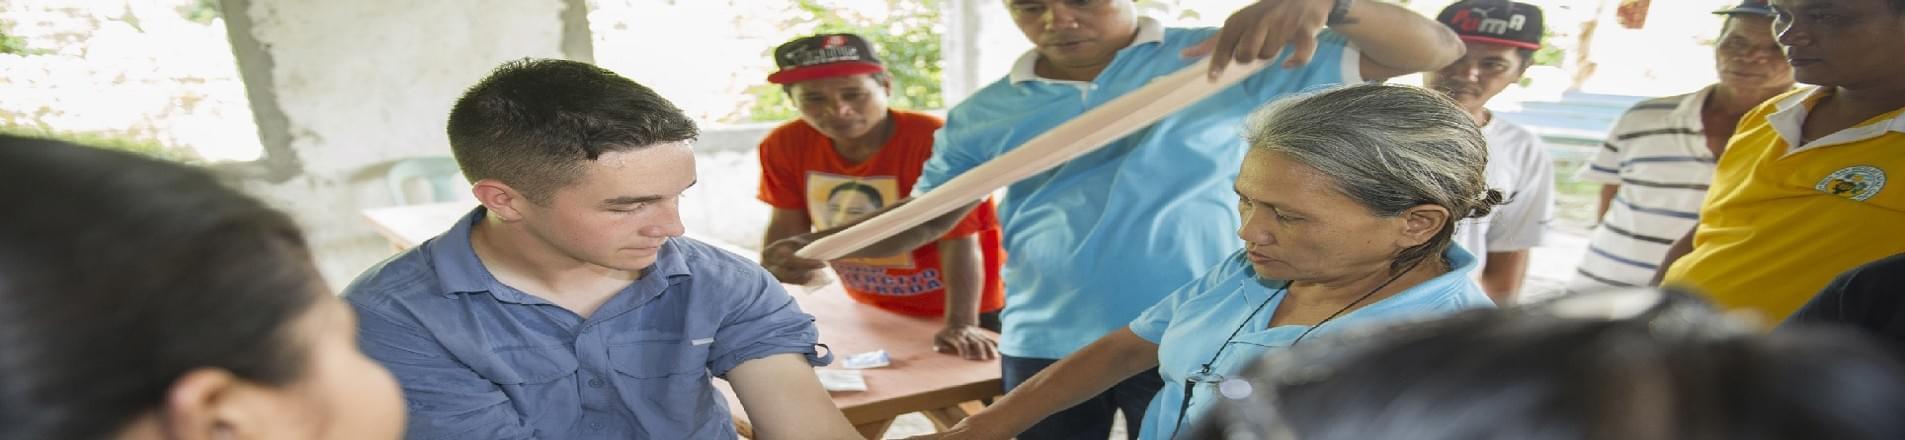 UWE to support children with injury-related trauma